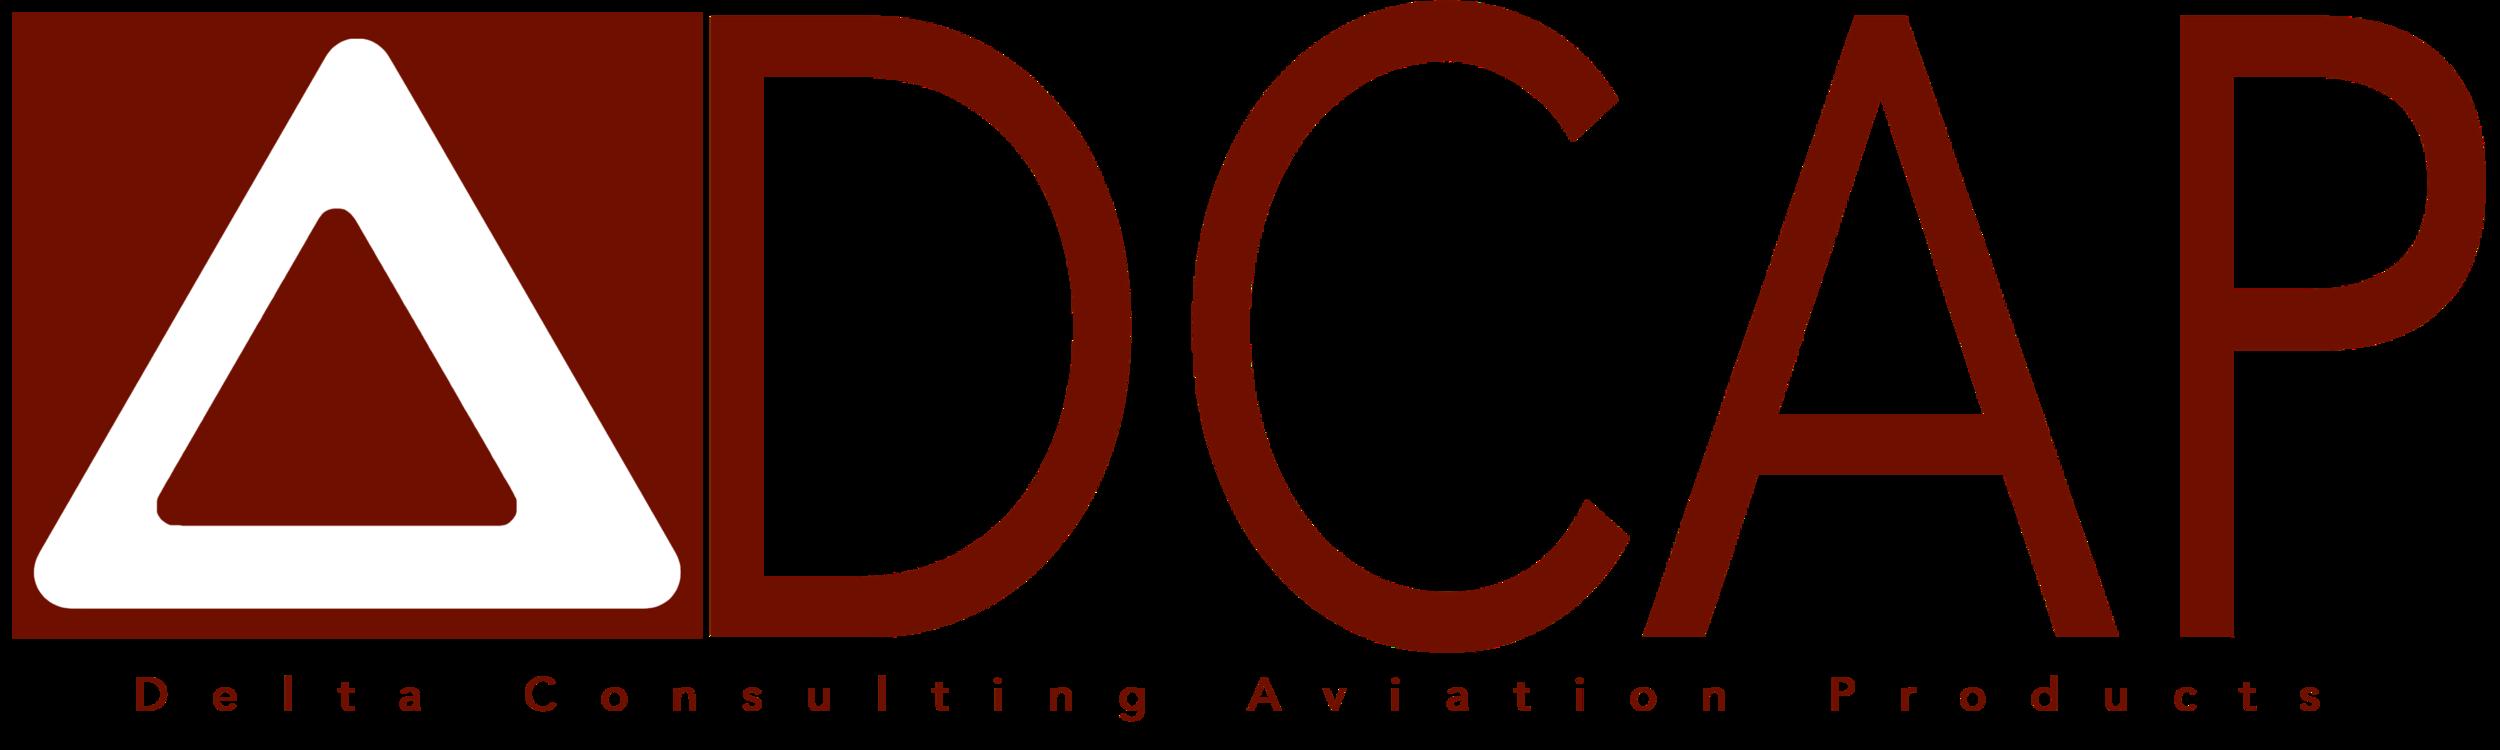 DCAP Logo Large.png